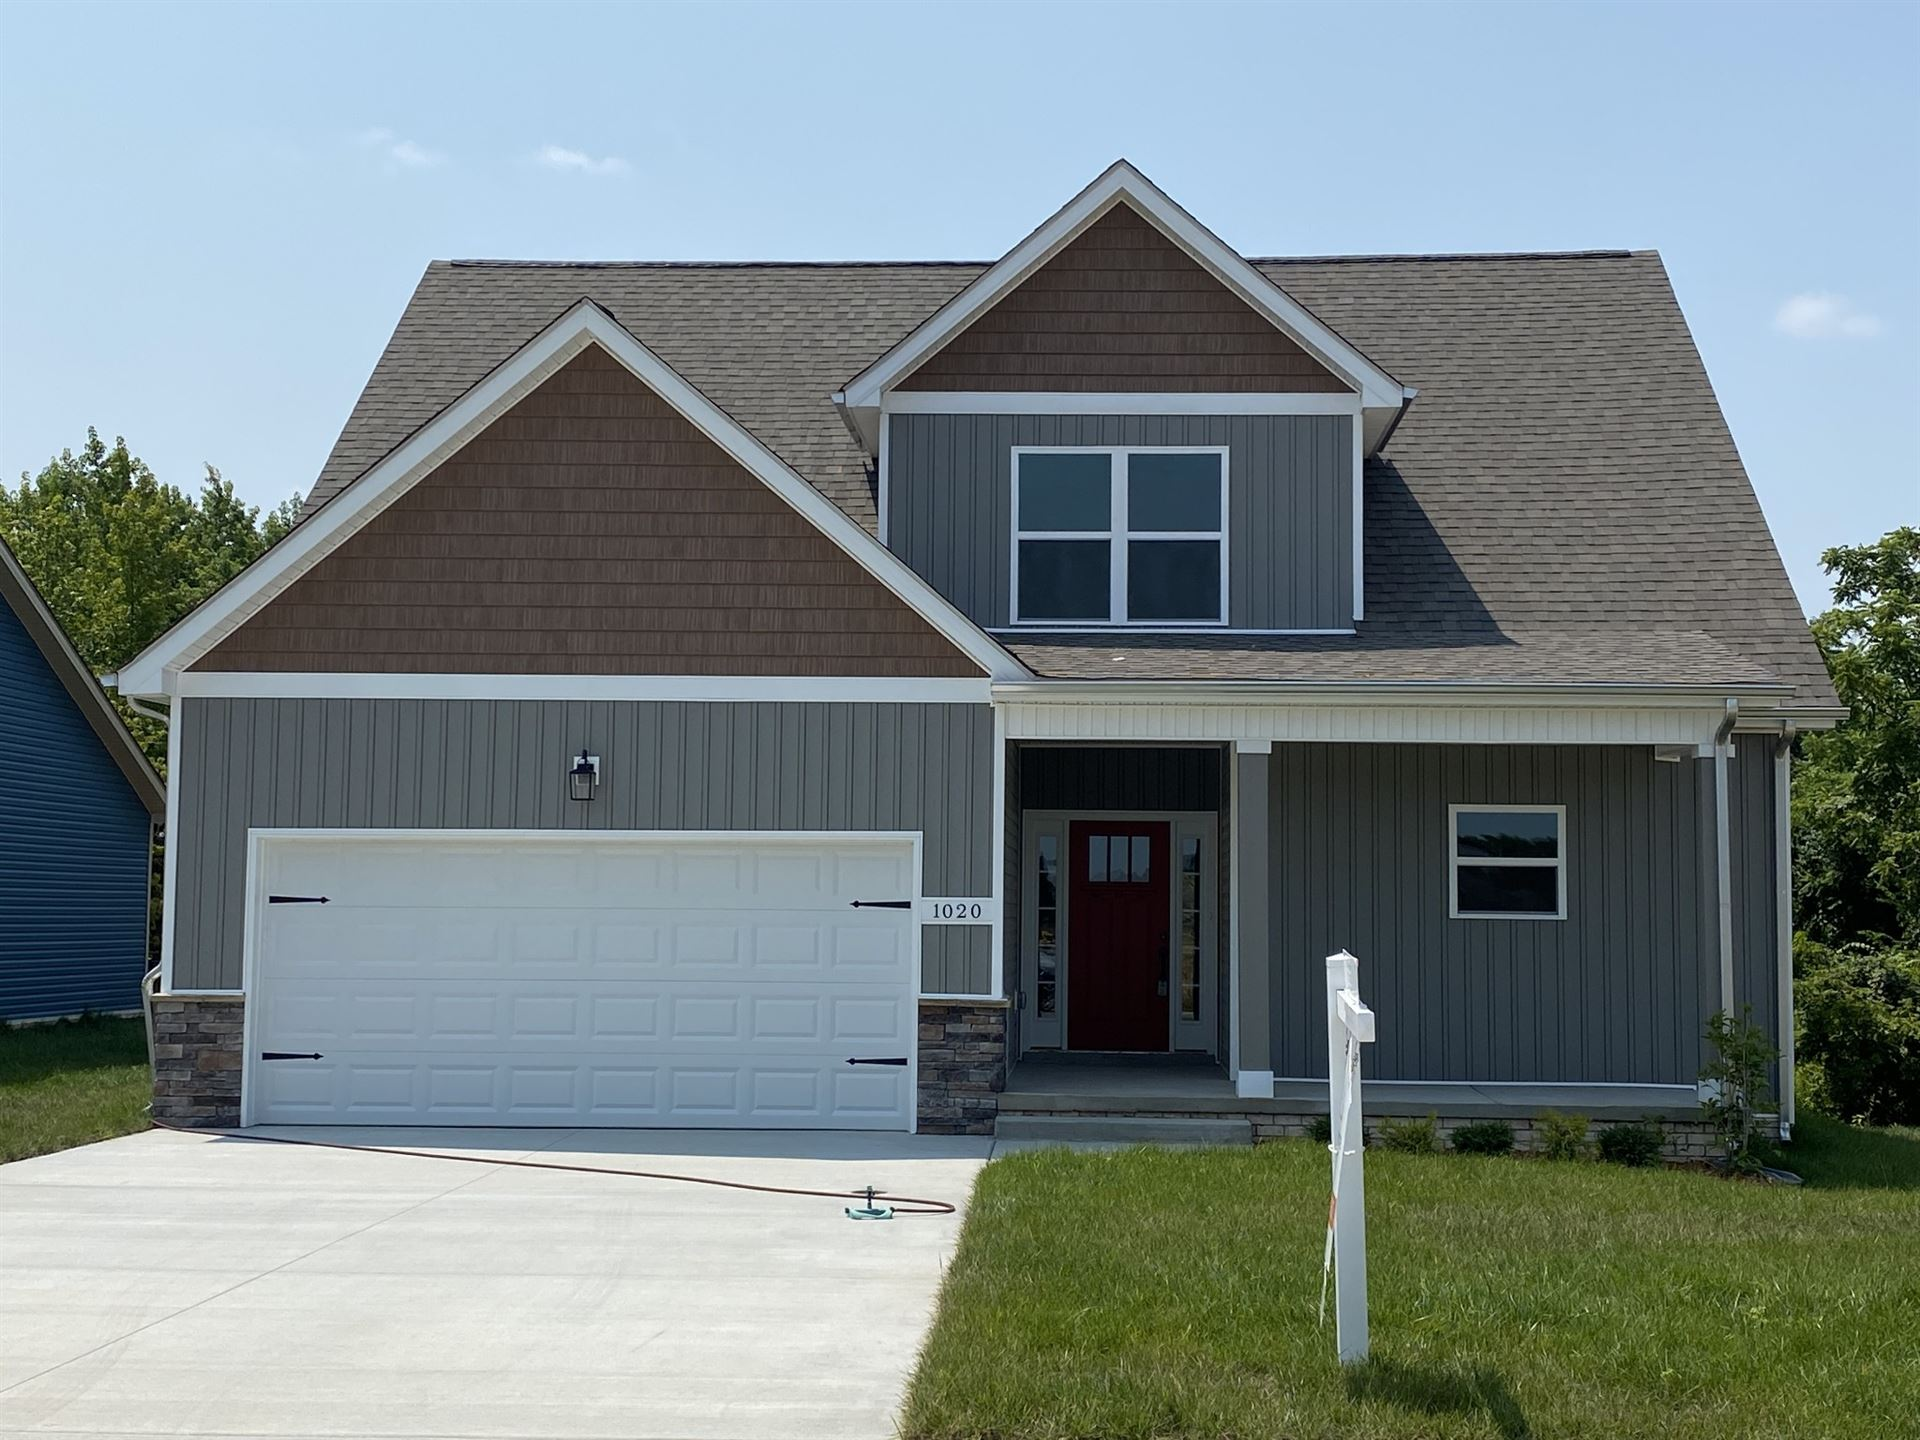 1020 Berry Bend (Lot 6), Clarksville, TN 37043 - MLS#: 2245853